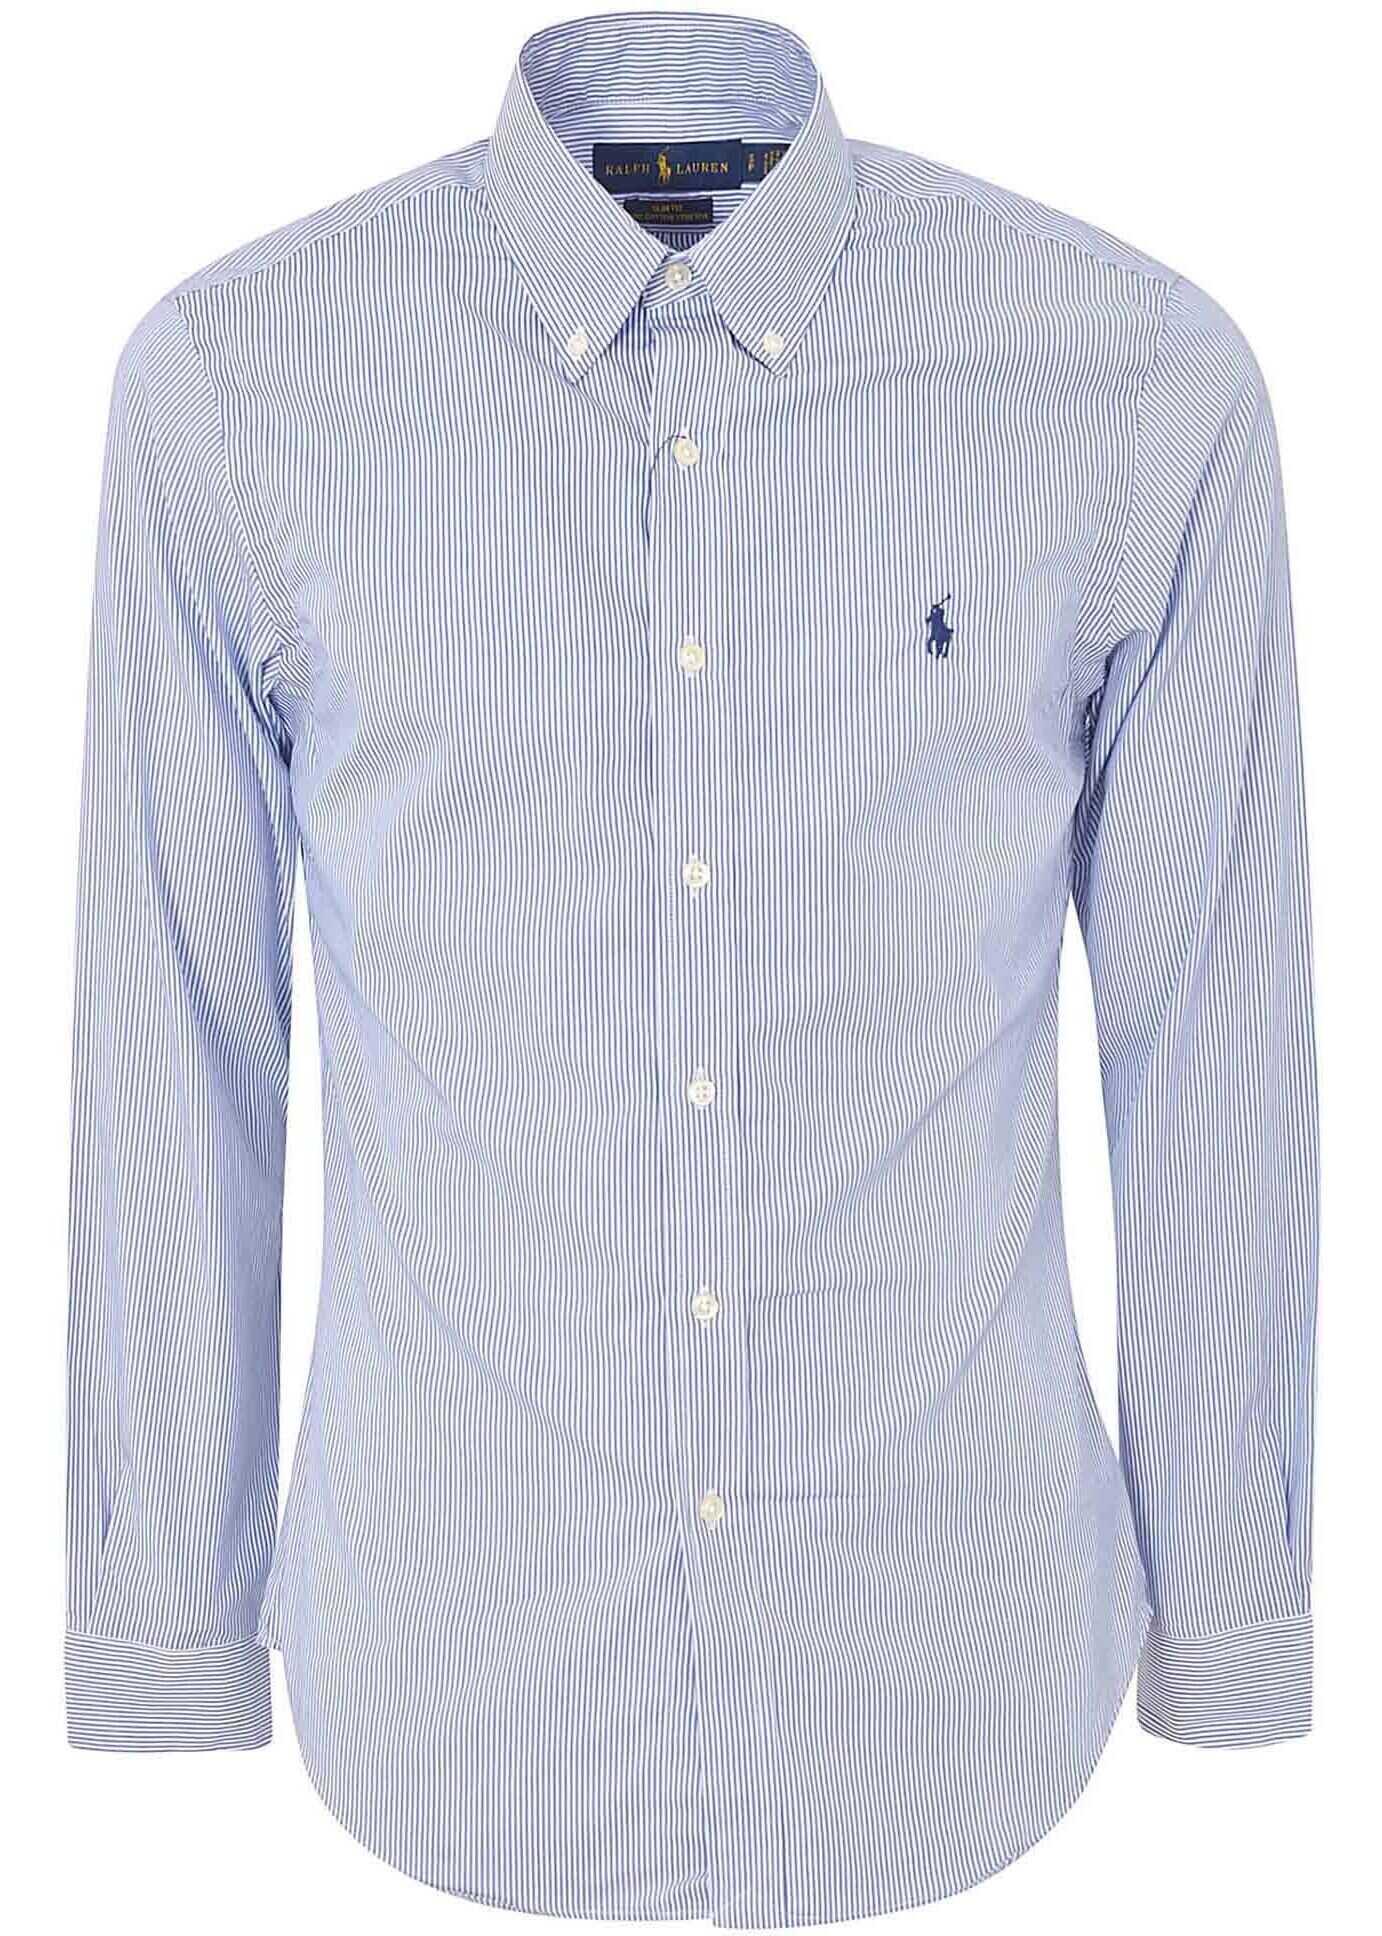 Ralph Lauren Light Blue And White Striped Shirt Light Blue imagine